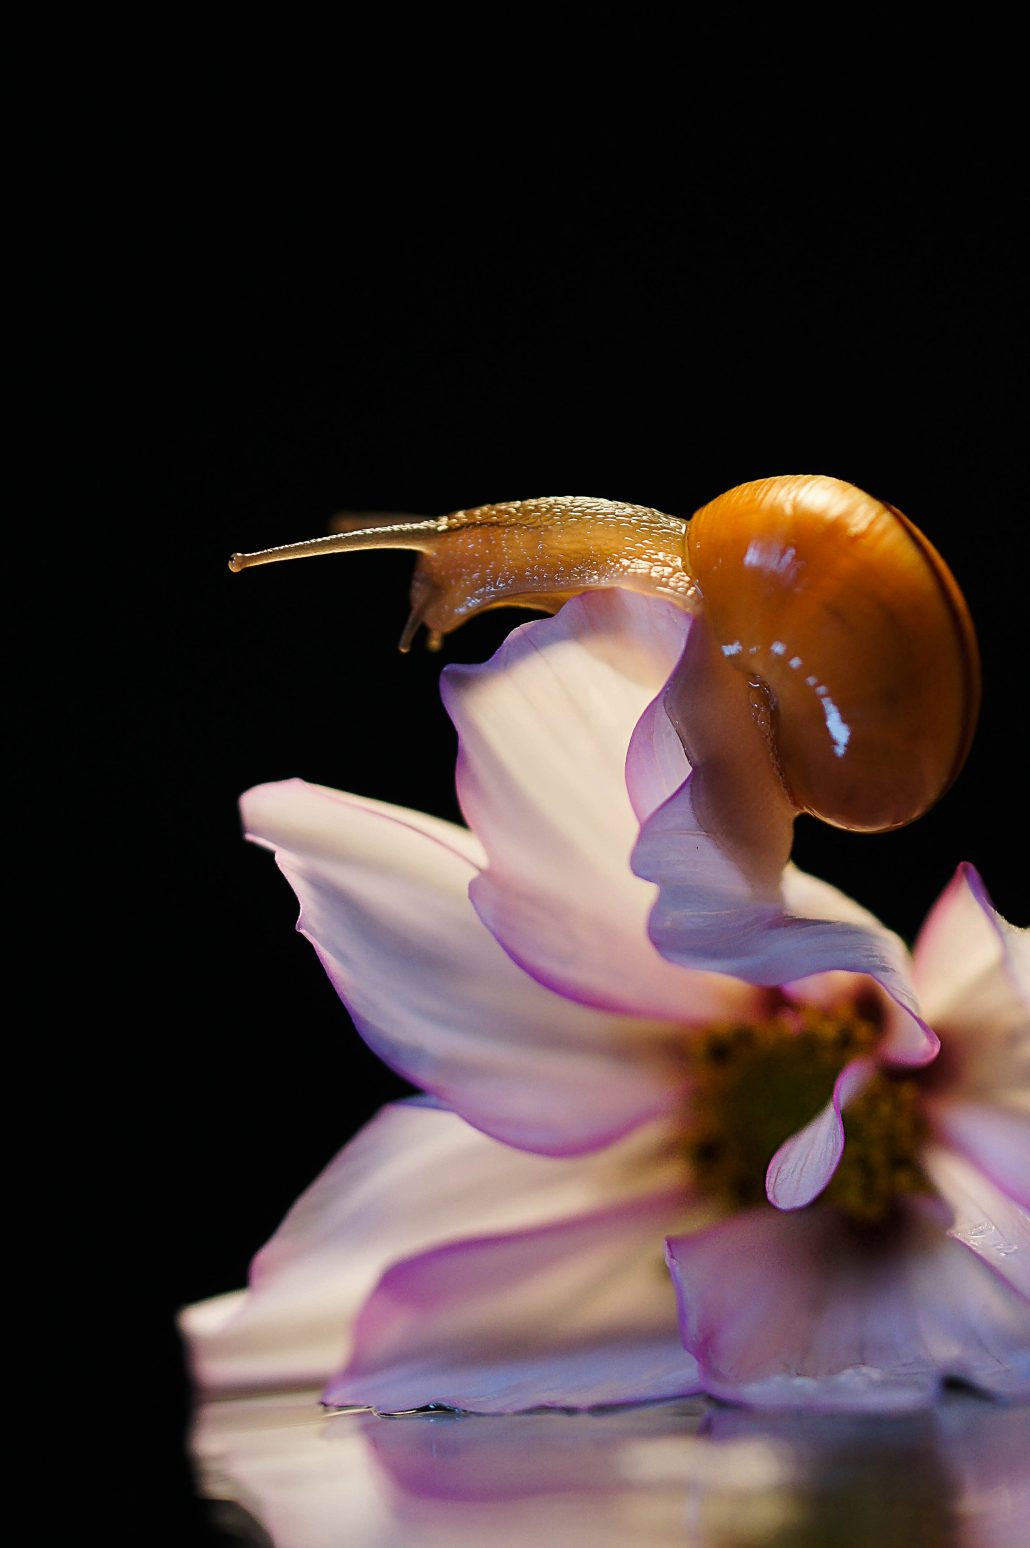 Monsieur escargot